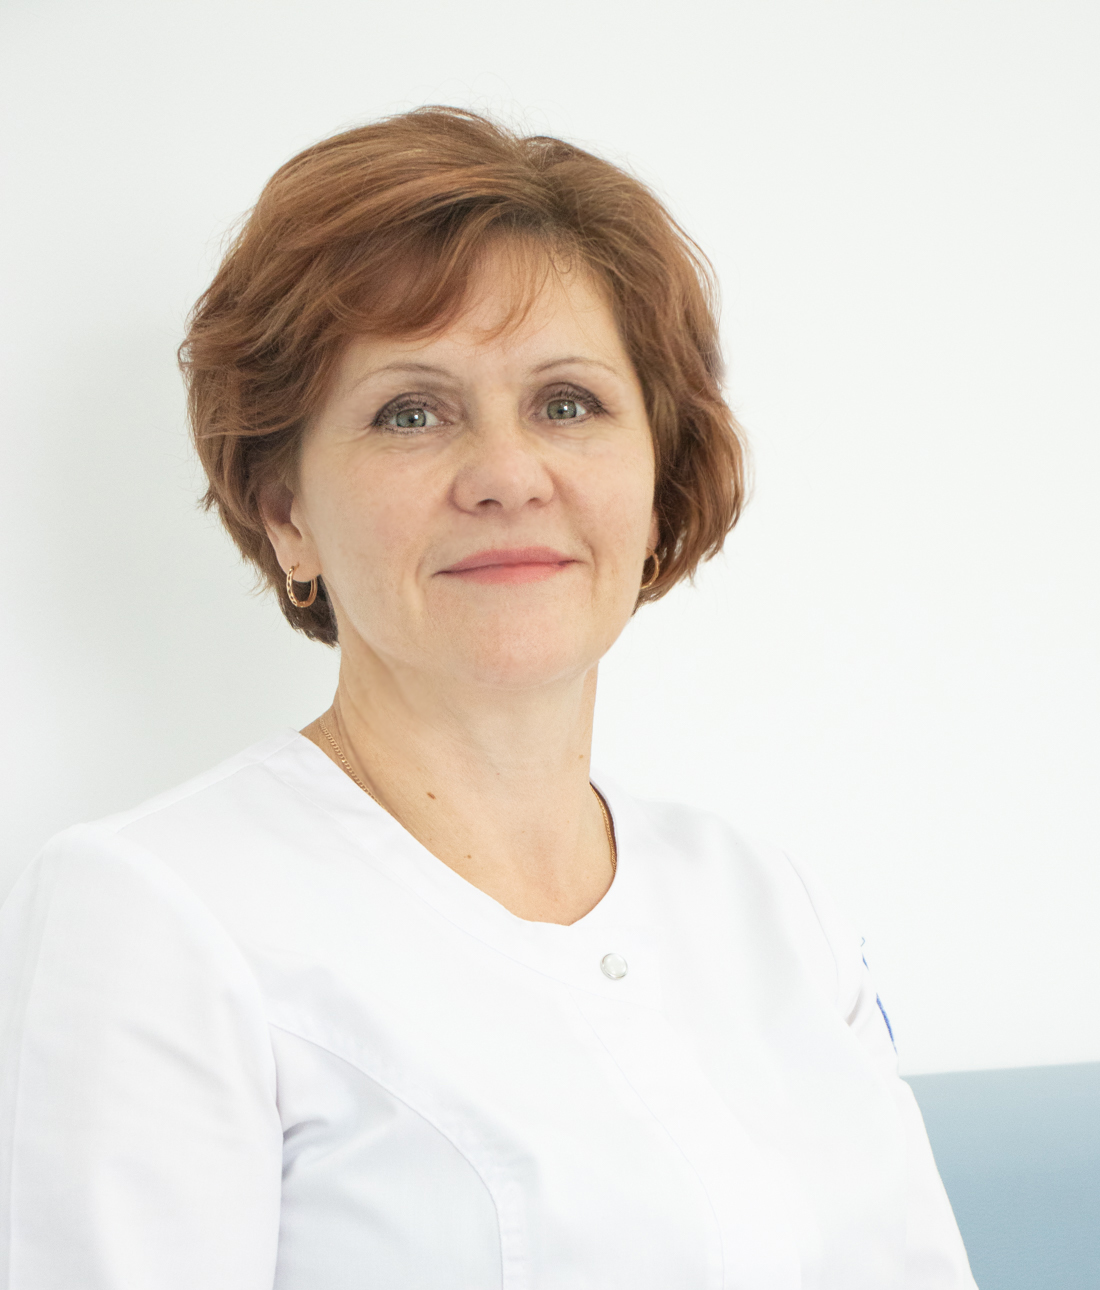 Соколова Елена Анатольевна